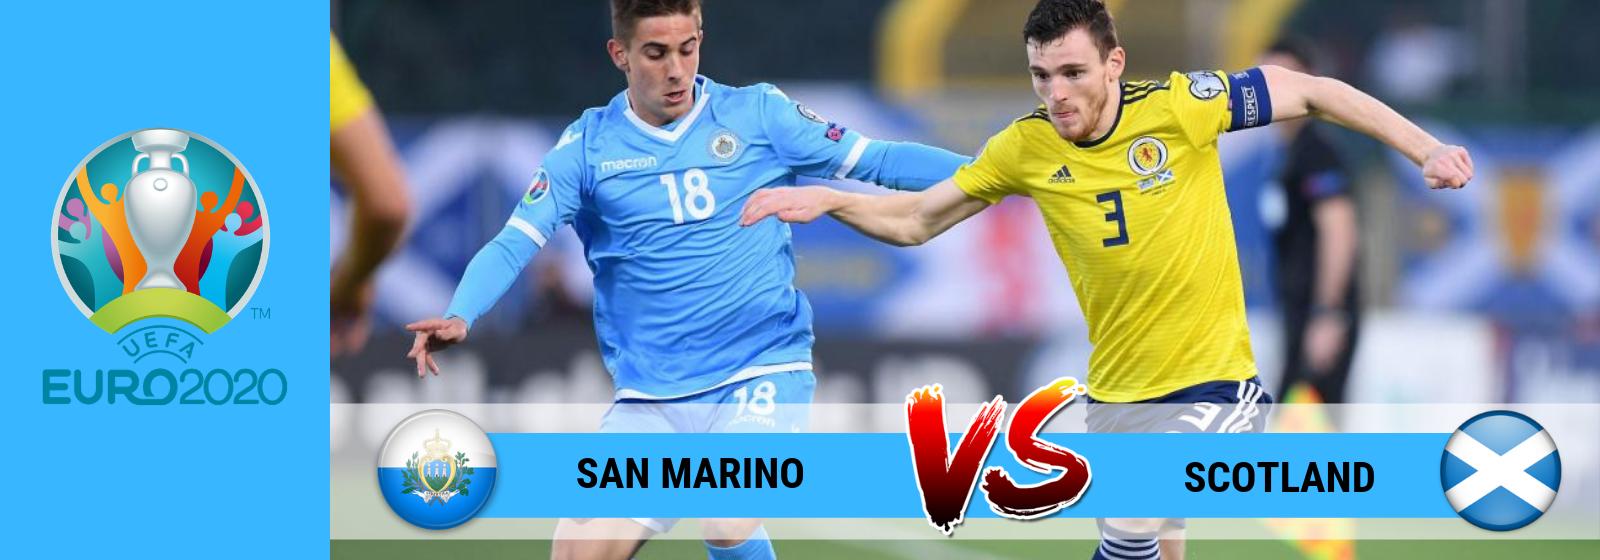 San Marino vs Scotland AsianConnect